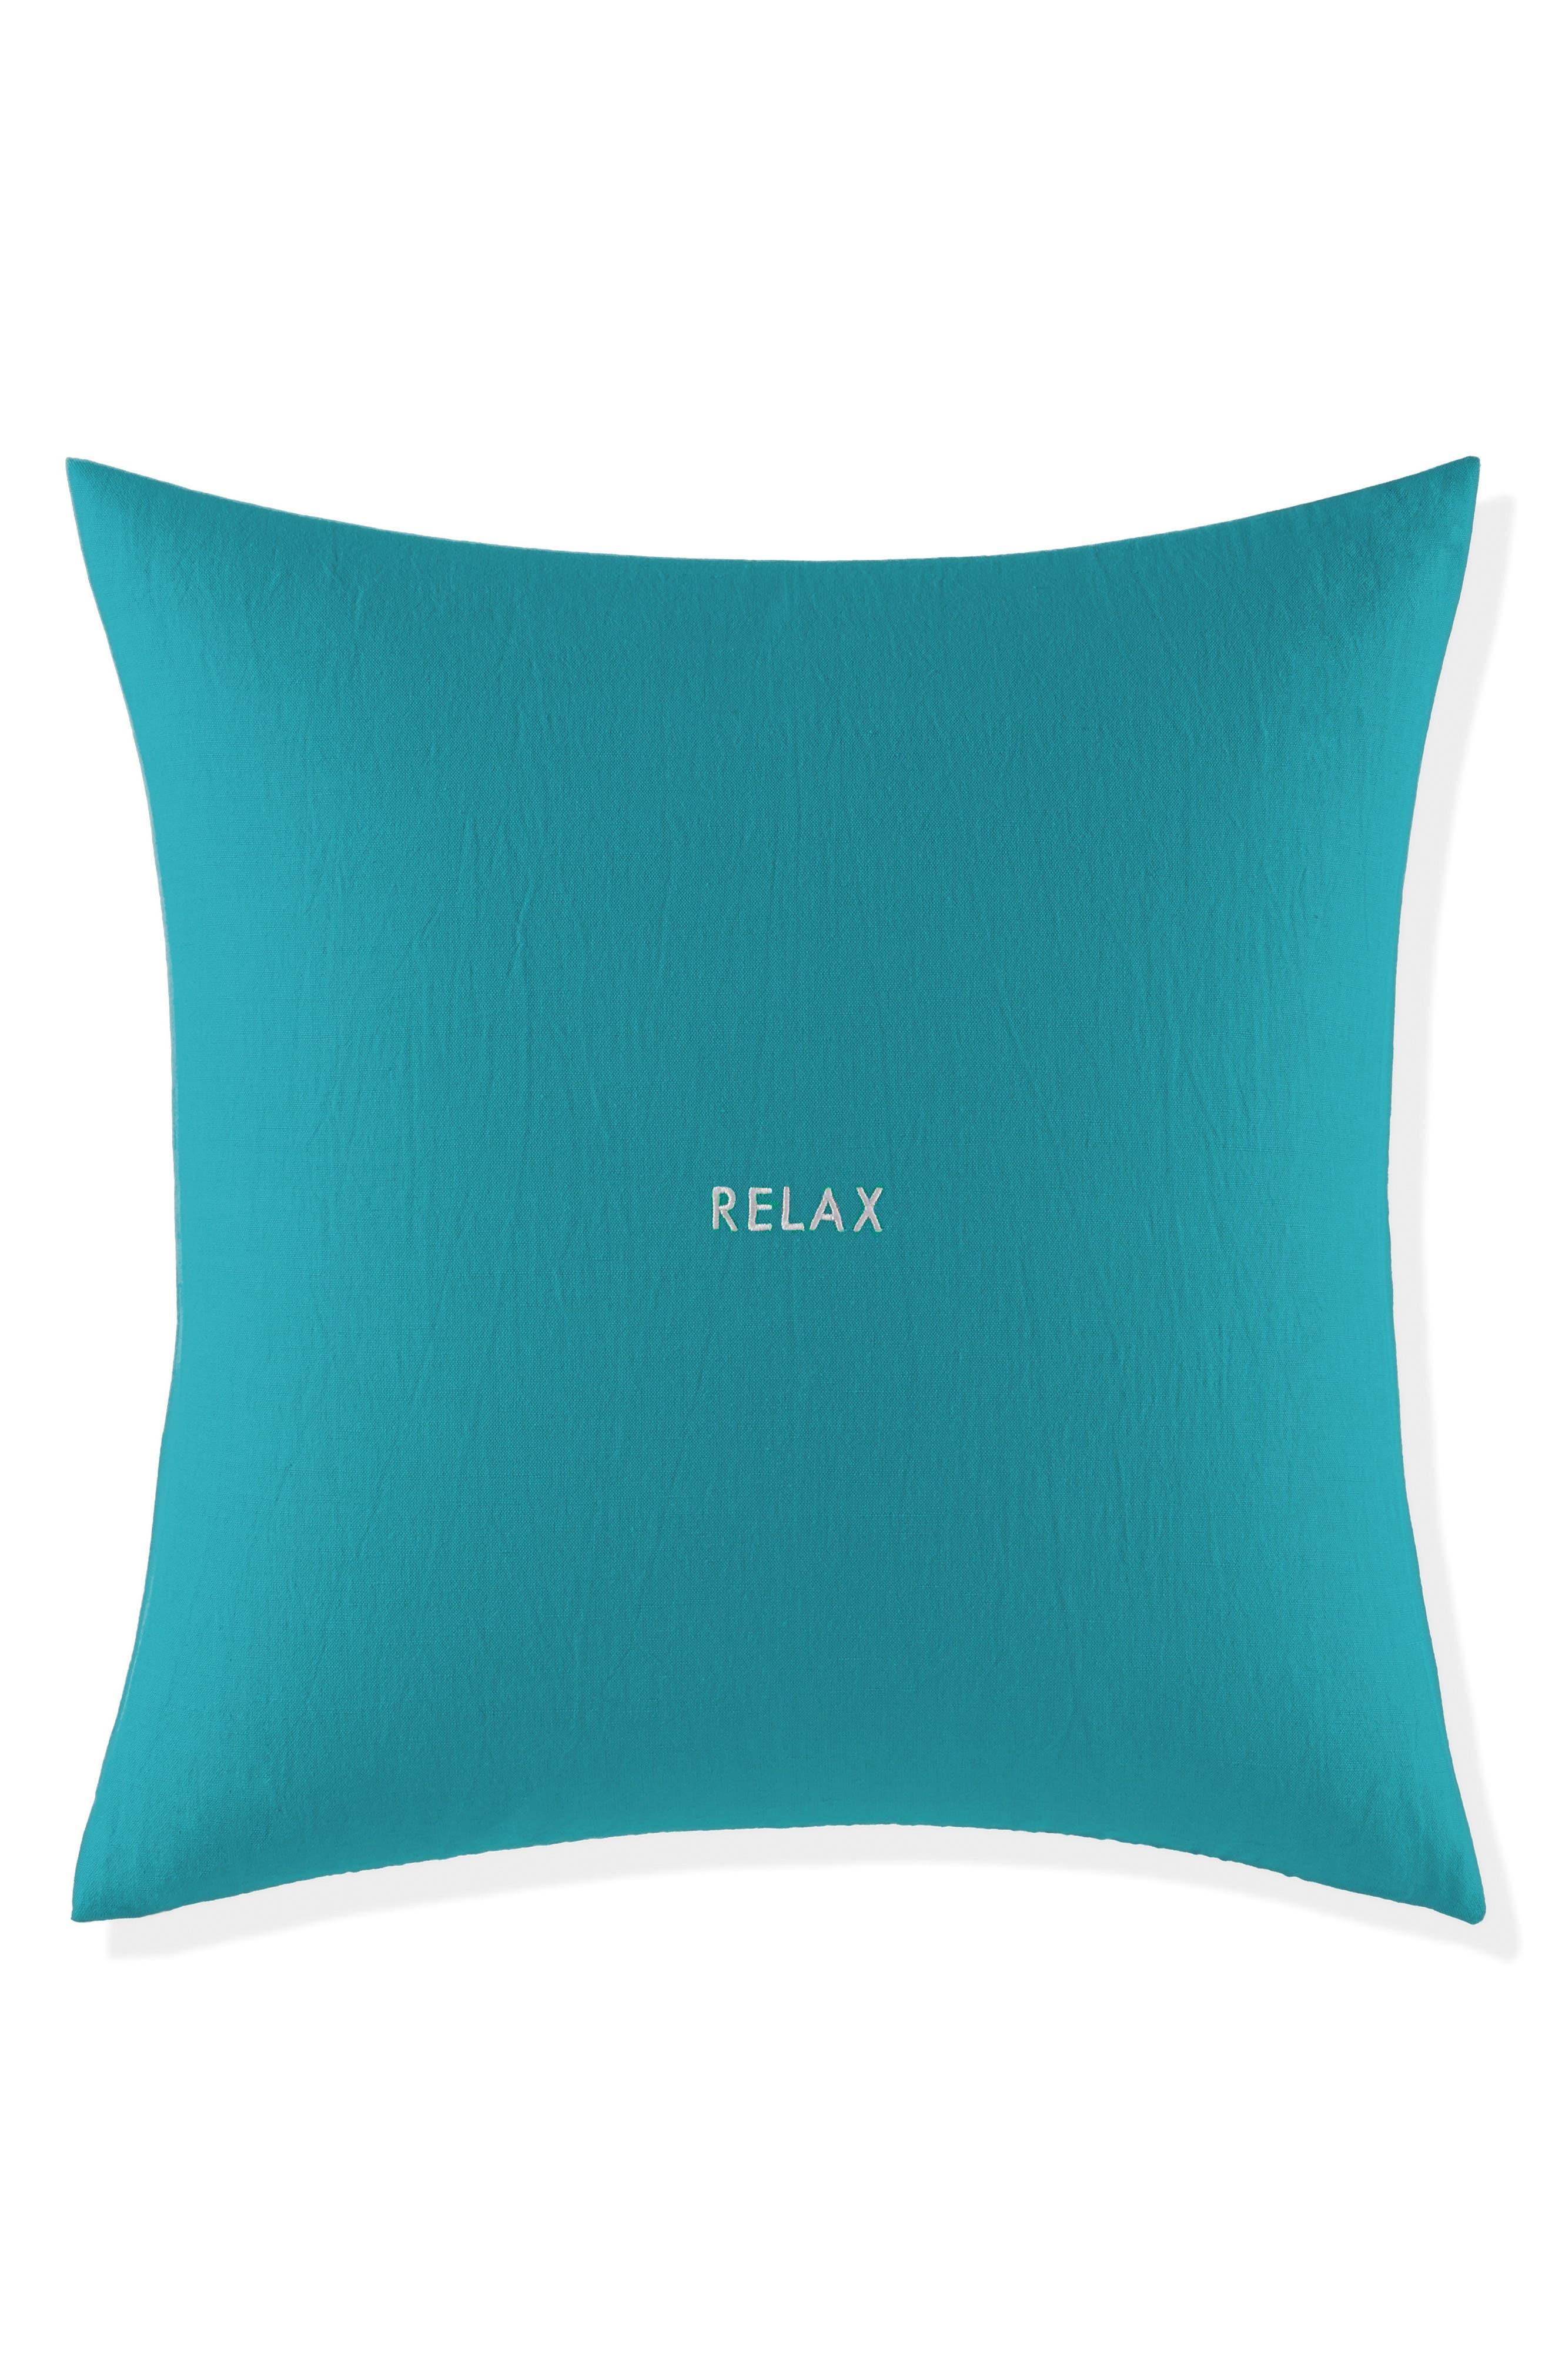 kate spade new york relax pillow